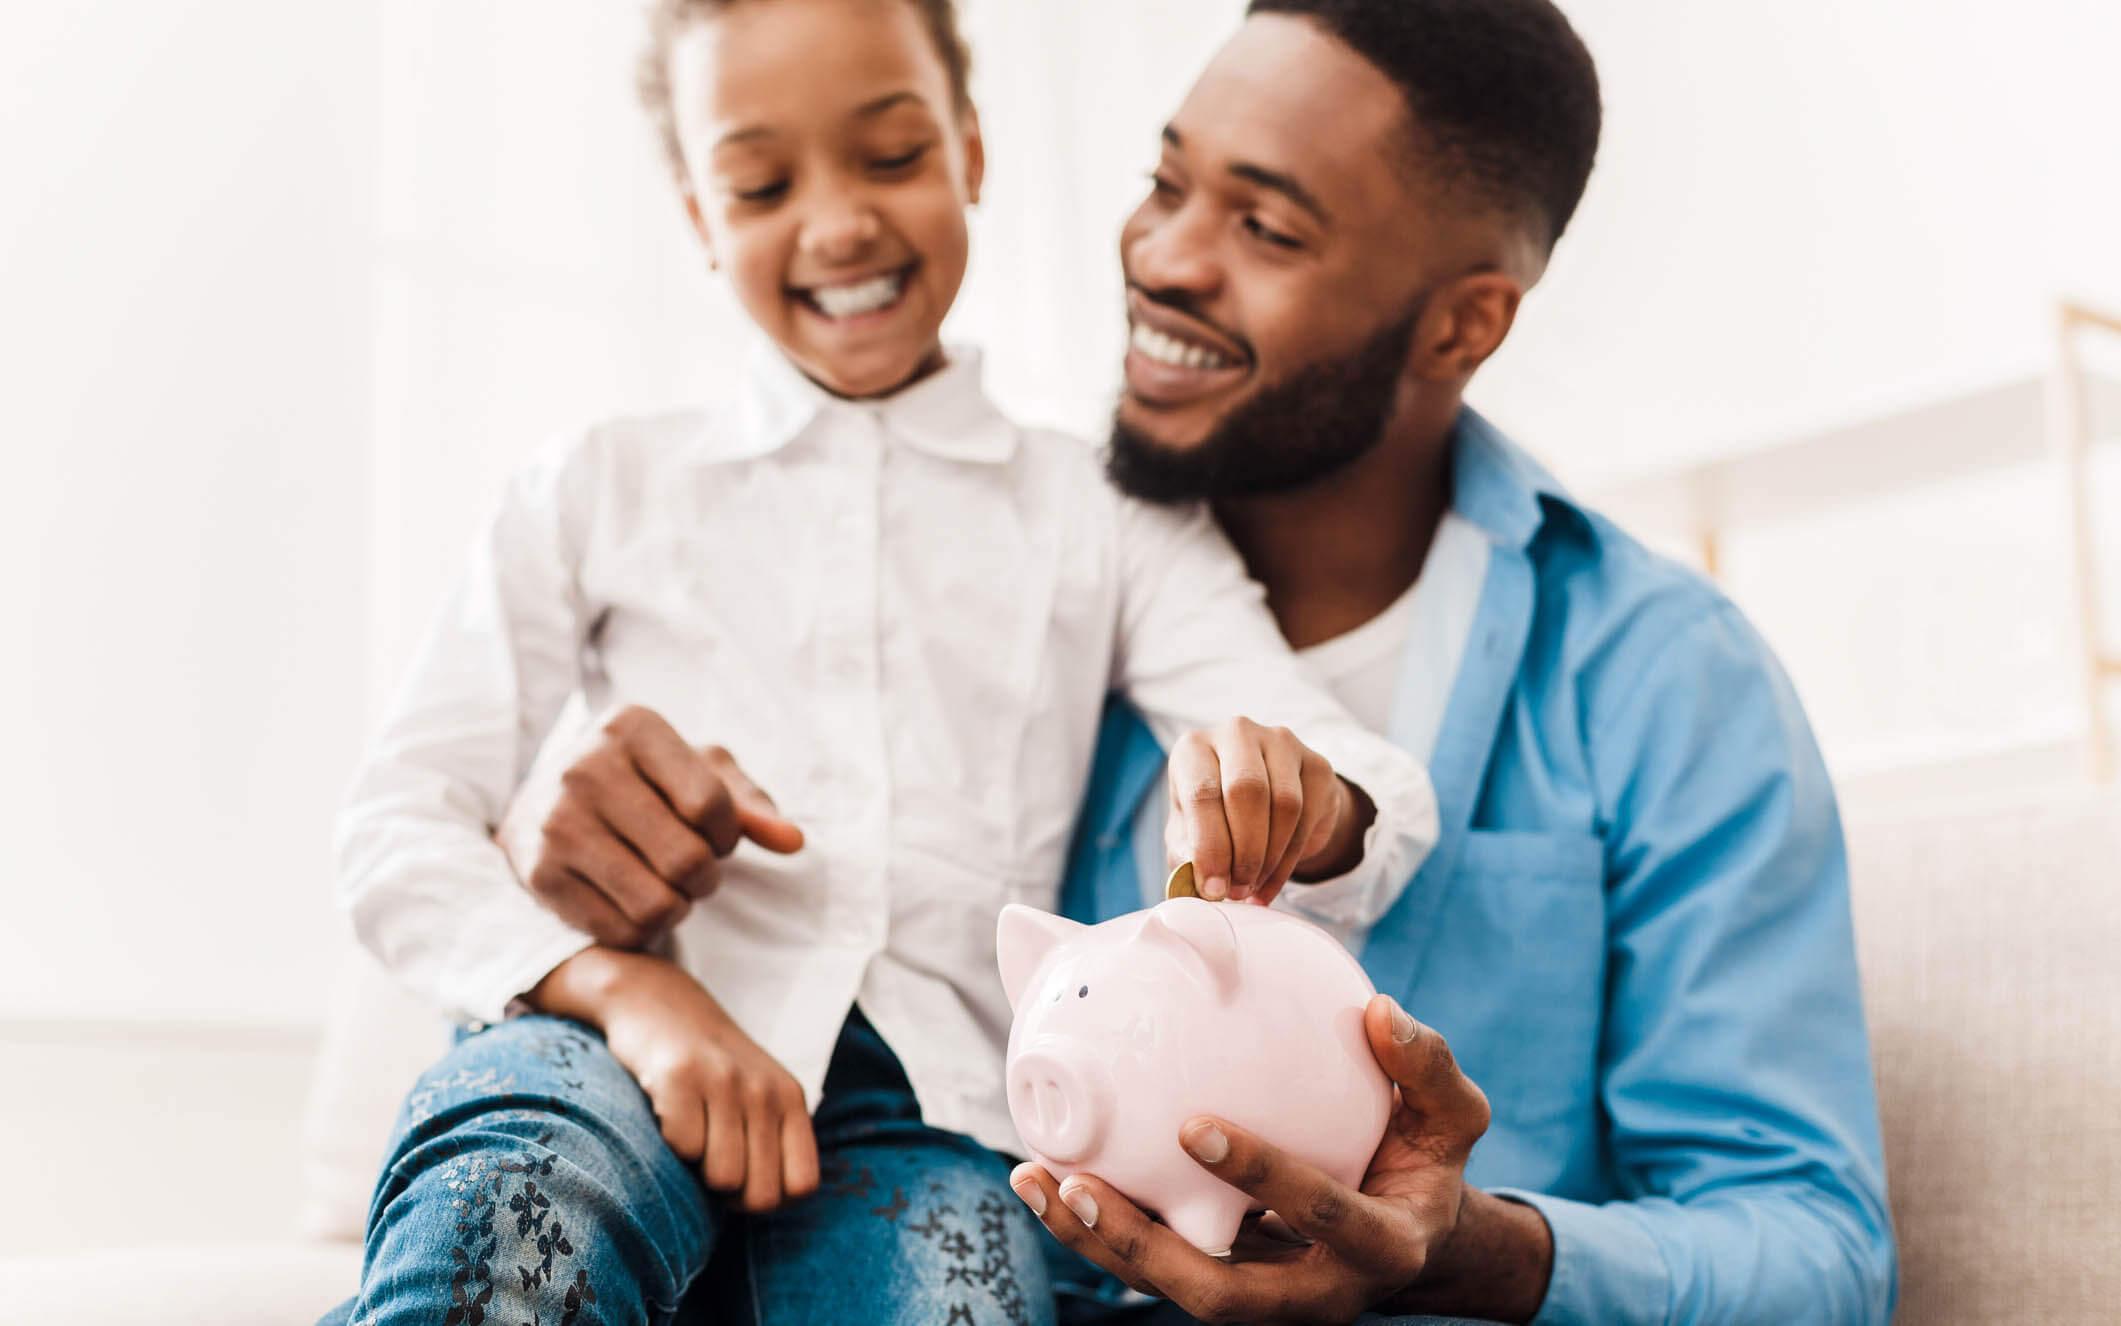 Saving Money While You Sleep - The Benefits of Automating Your Savings Plan FSCB